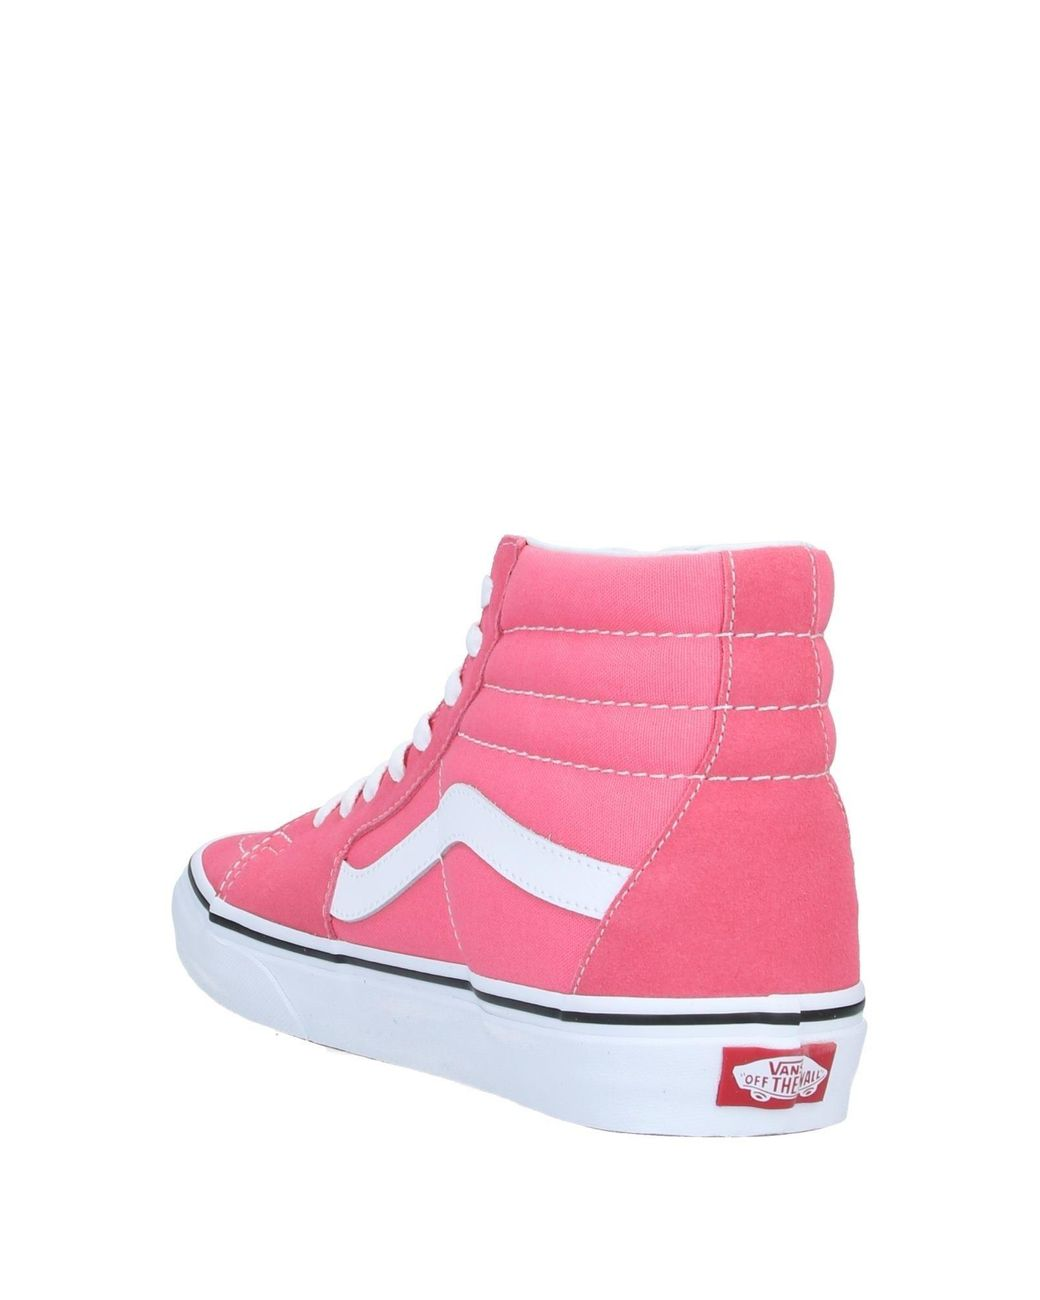 Vans Canvas High-tops \u0026 Sneakers in